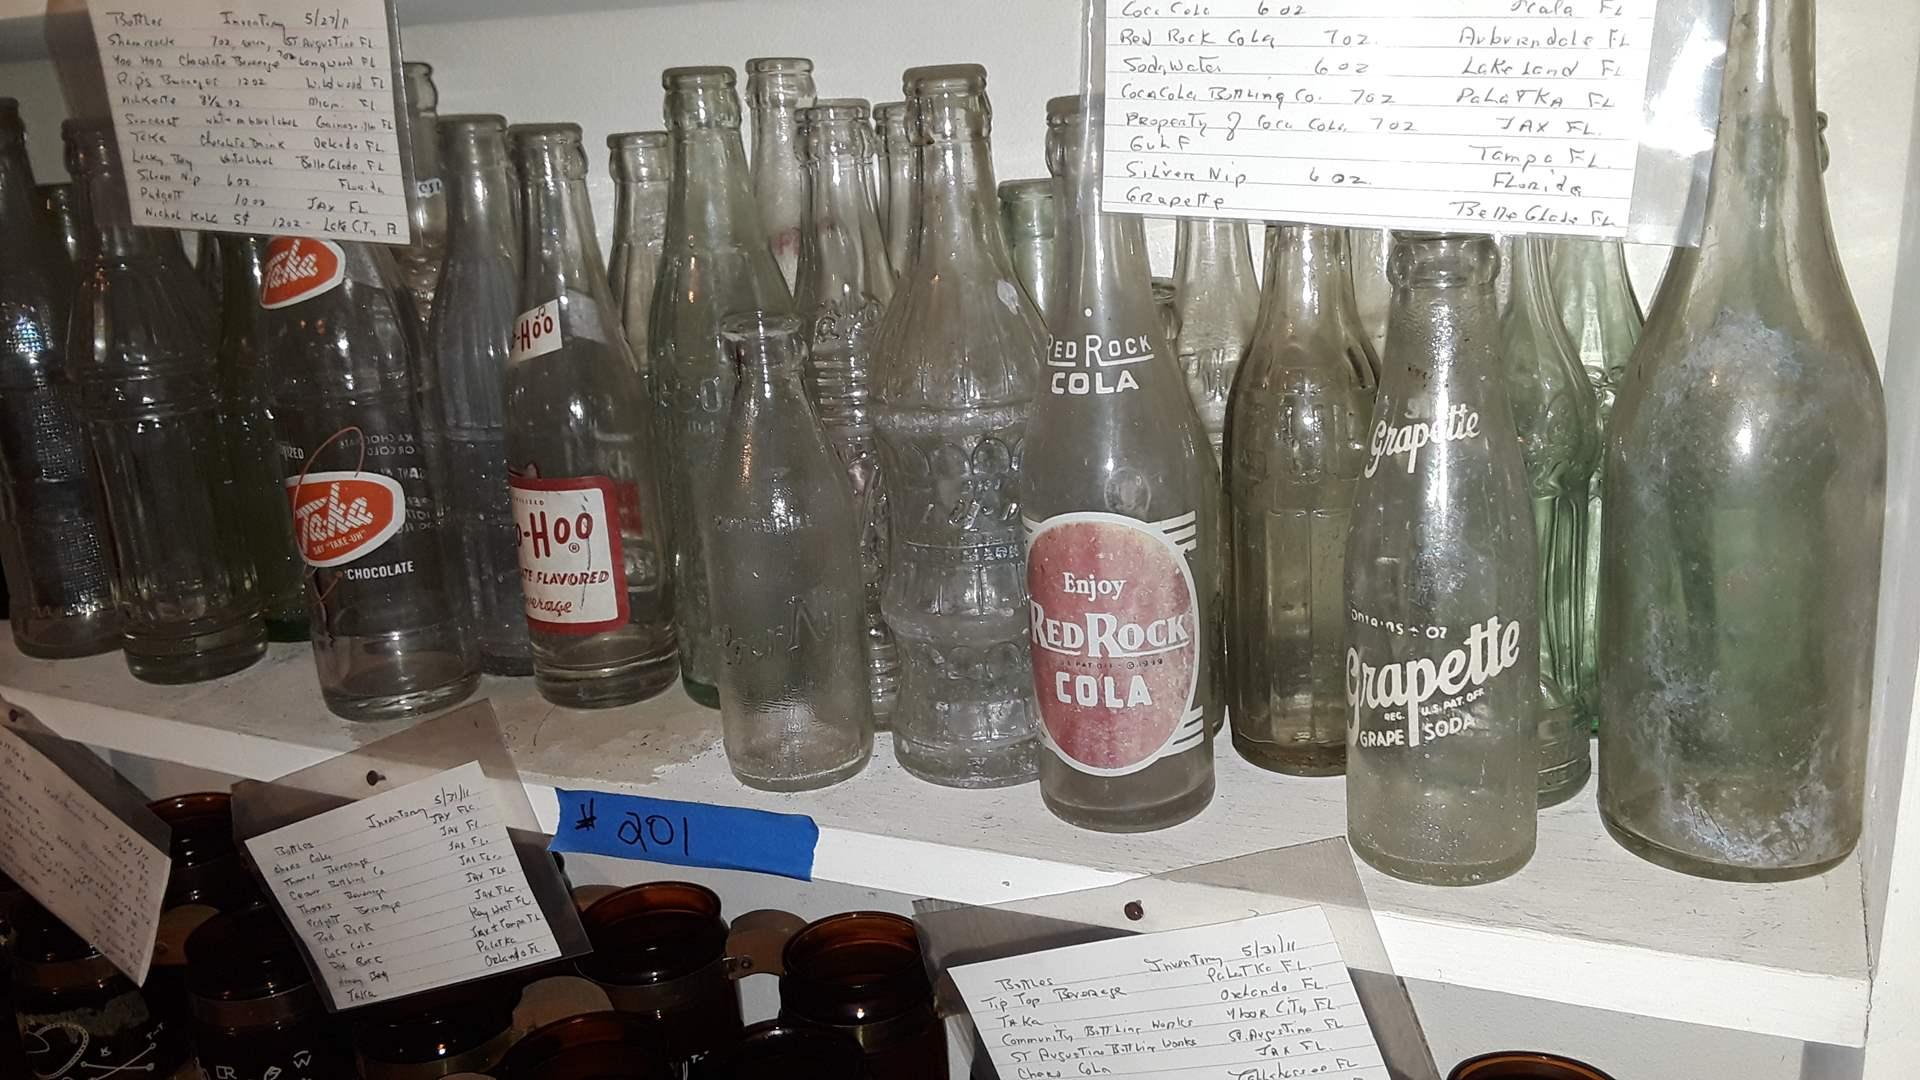 Lot # 201 COLLECTIBLE SODA BOTTLES, TA-KA, YOO HOO, RED ROCK, GRAPETTE